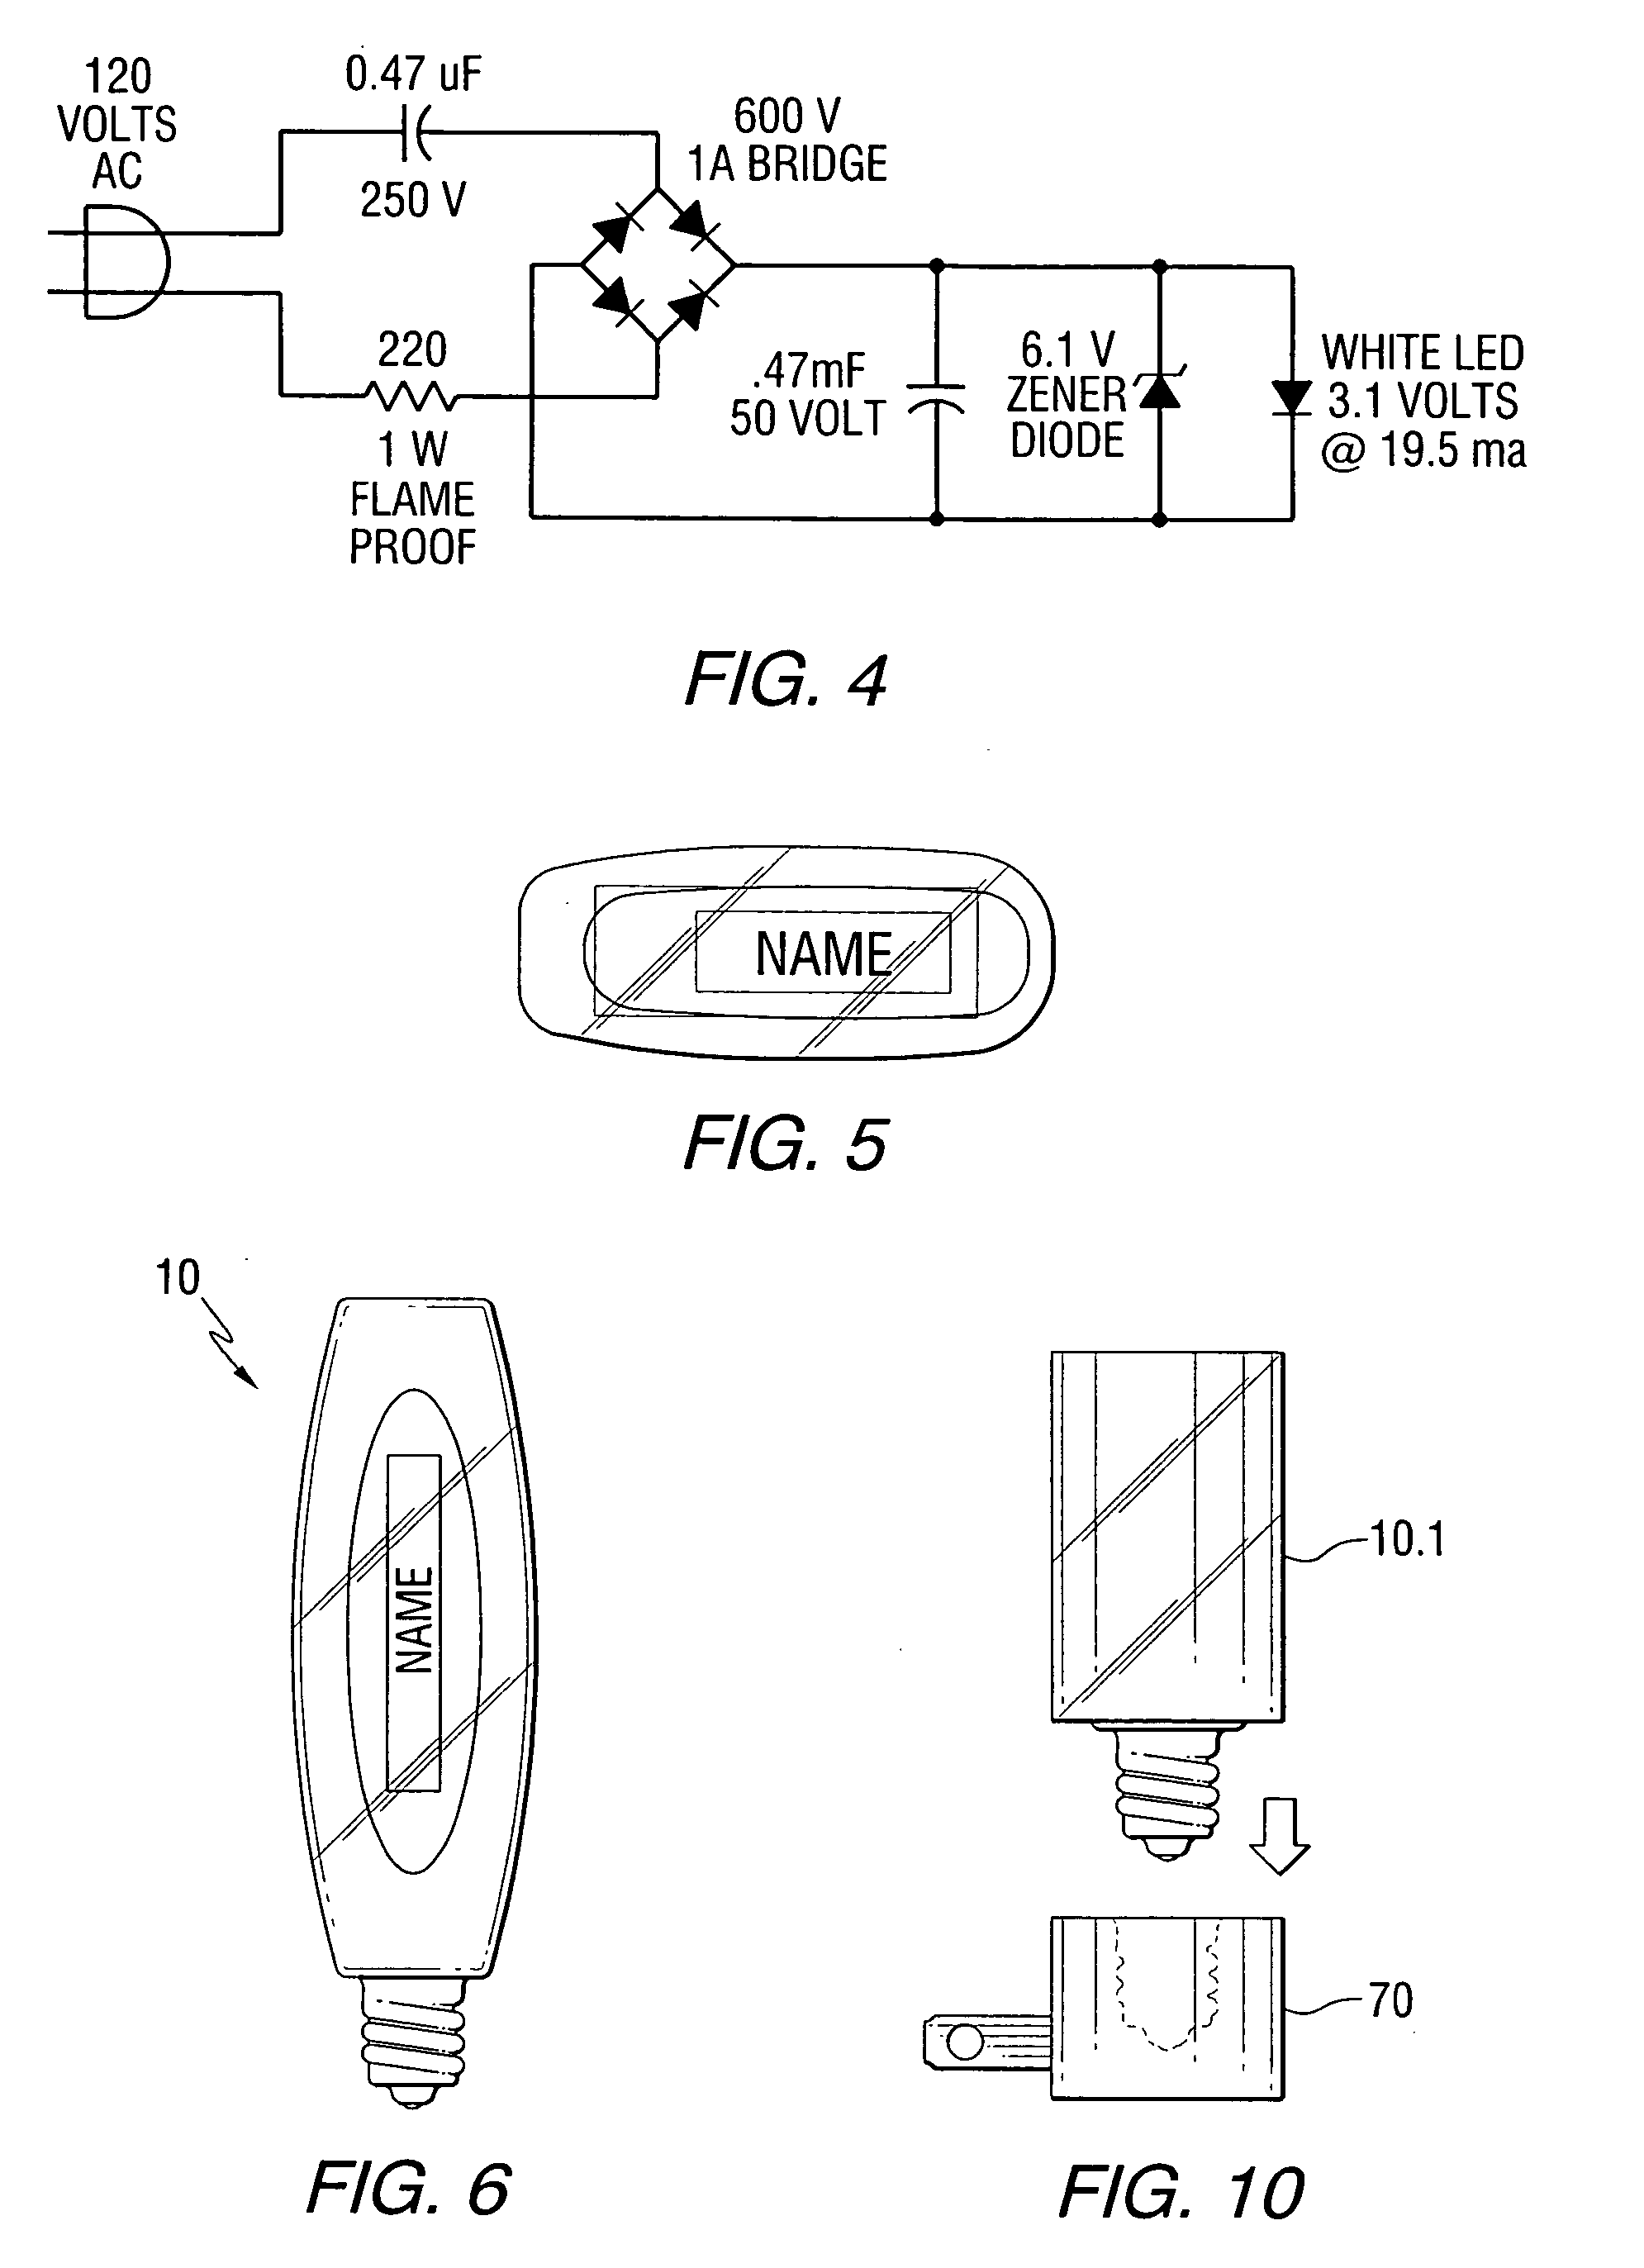 120 volt led night light circuit - Patent Drawing